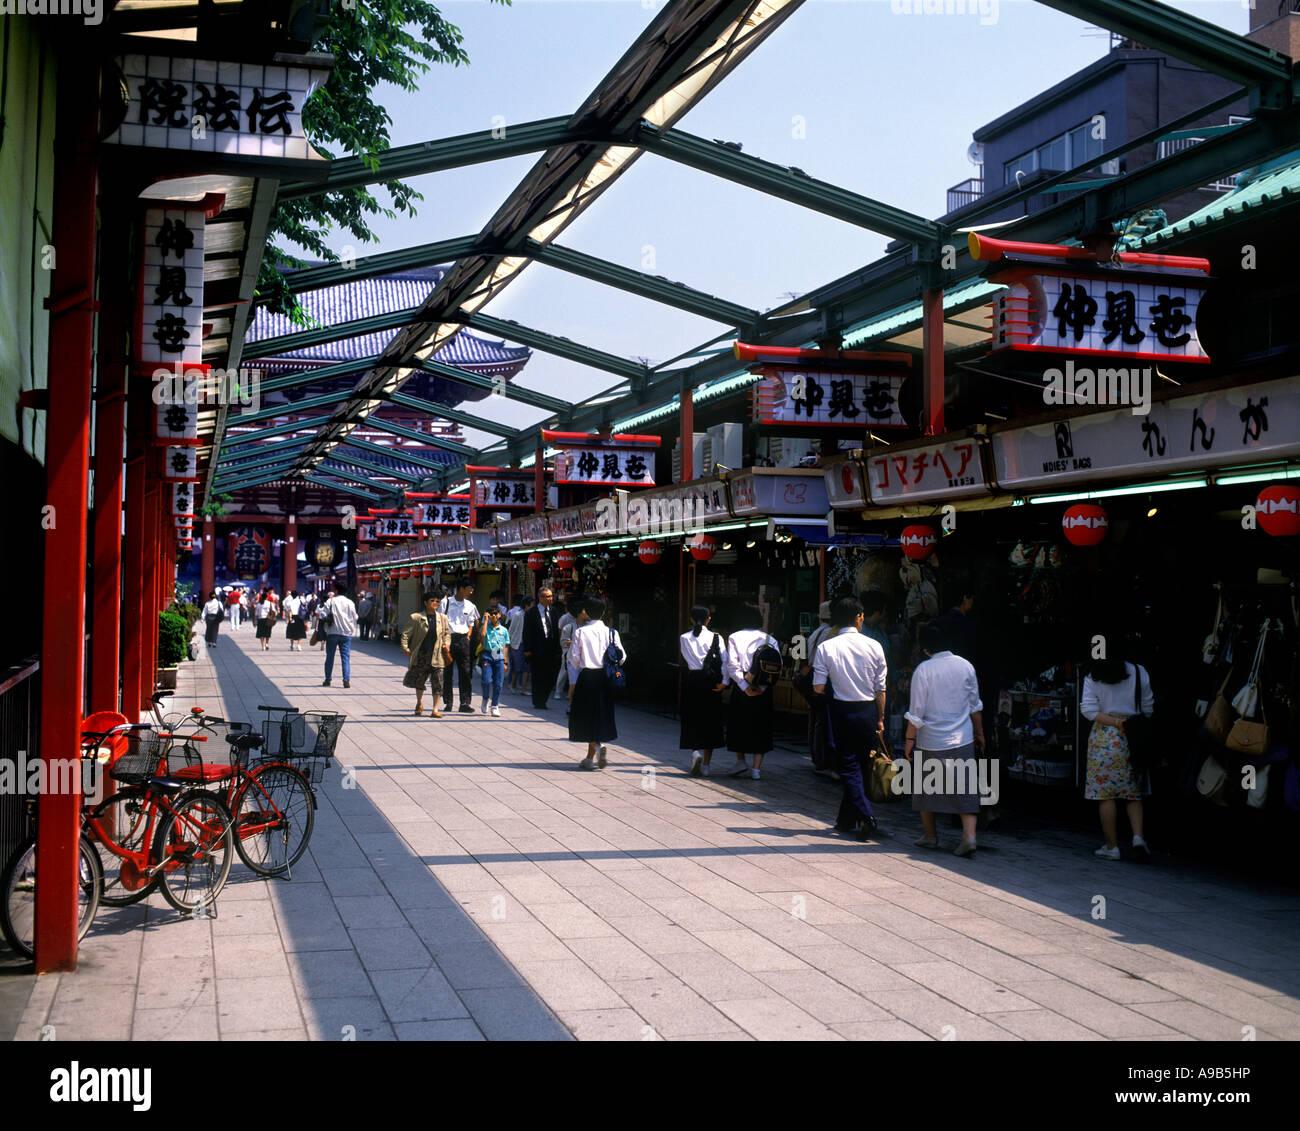 ASAKUSA OUTDOOR MARKET TOKYO JAPAN Stock Photo, Royalty ...